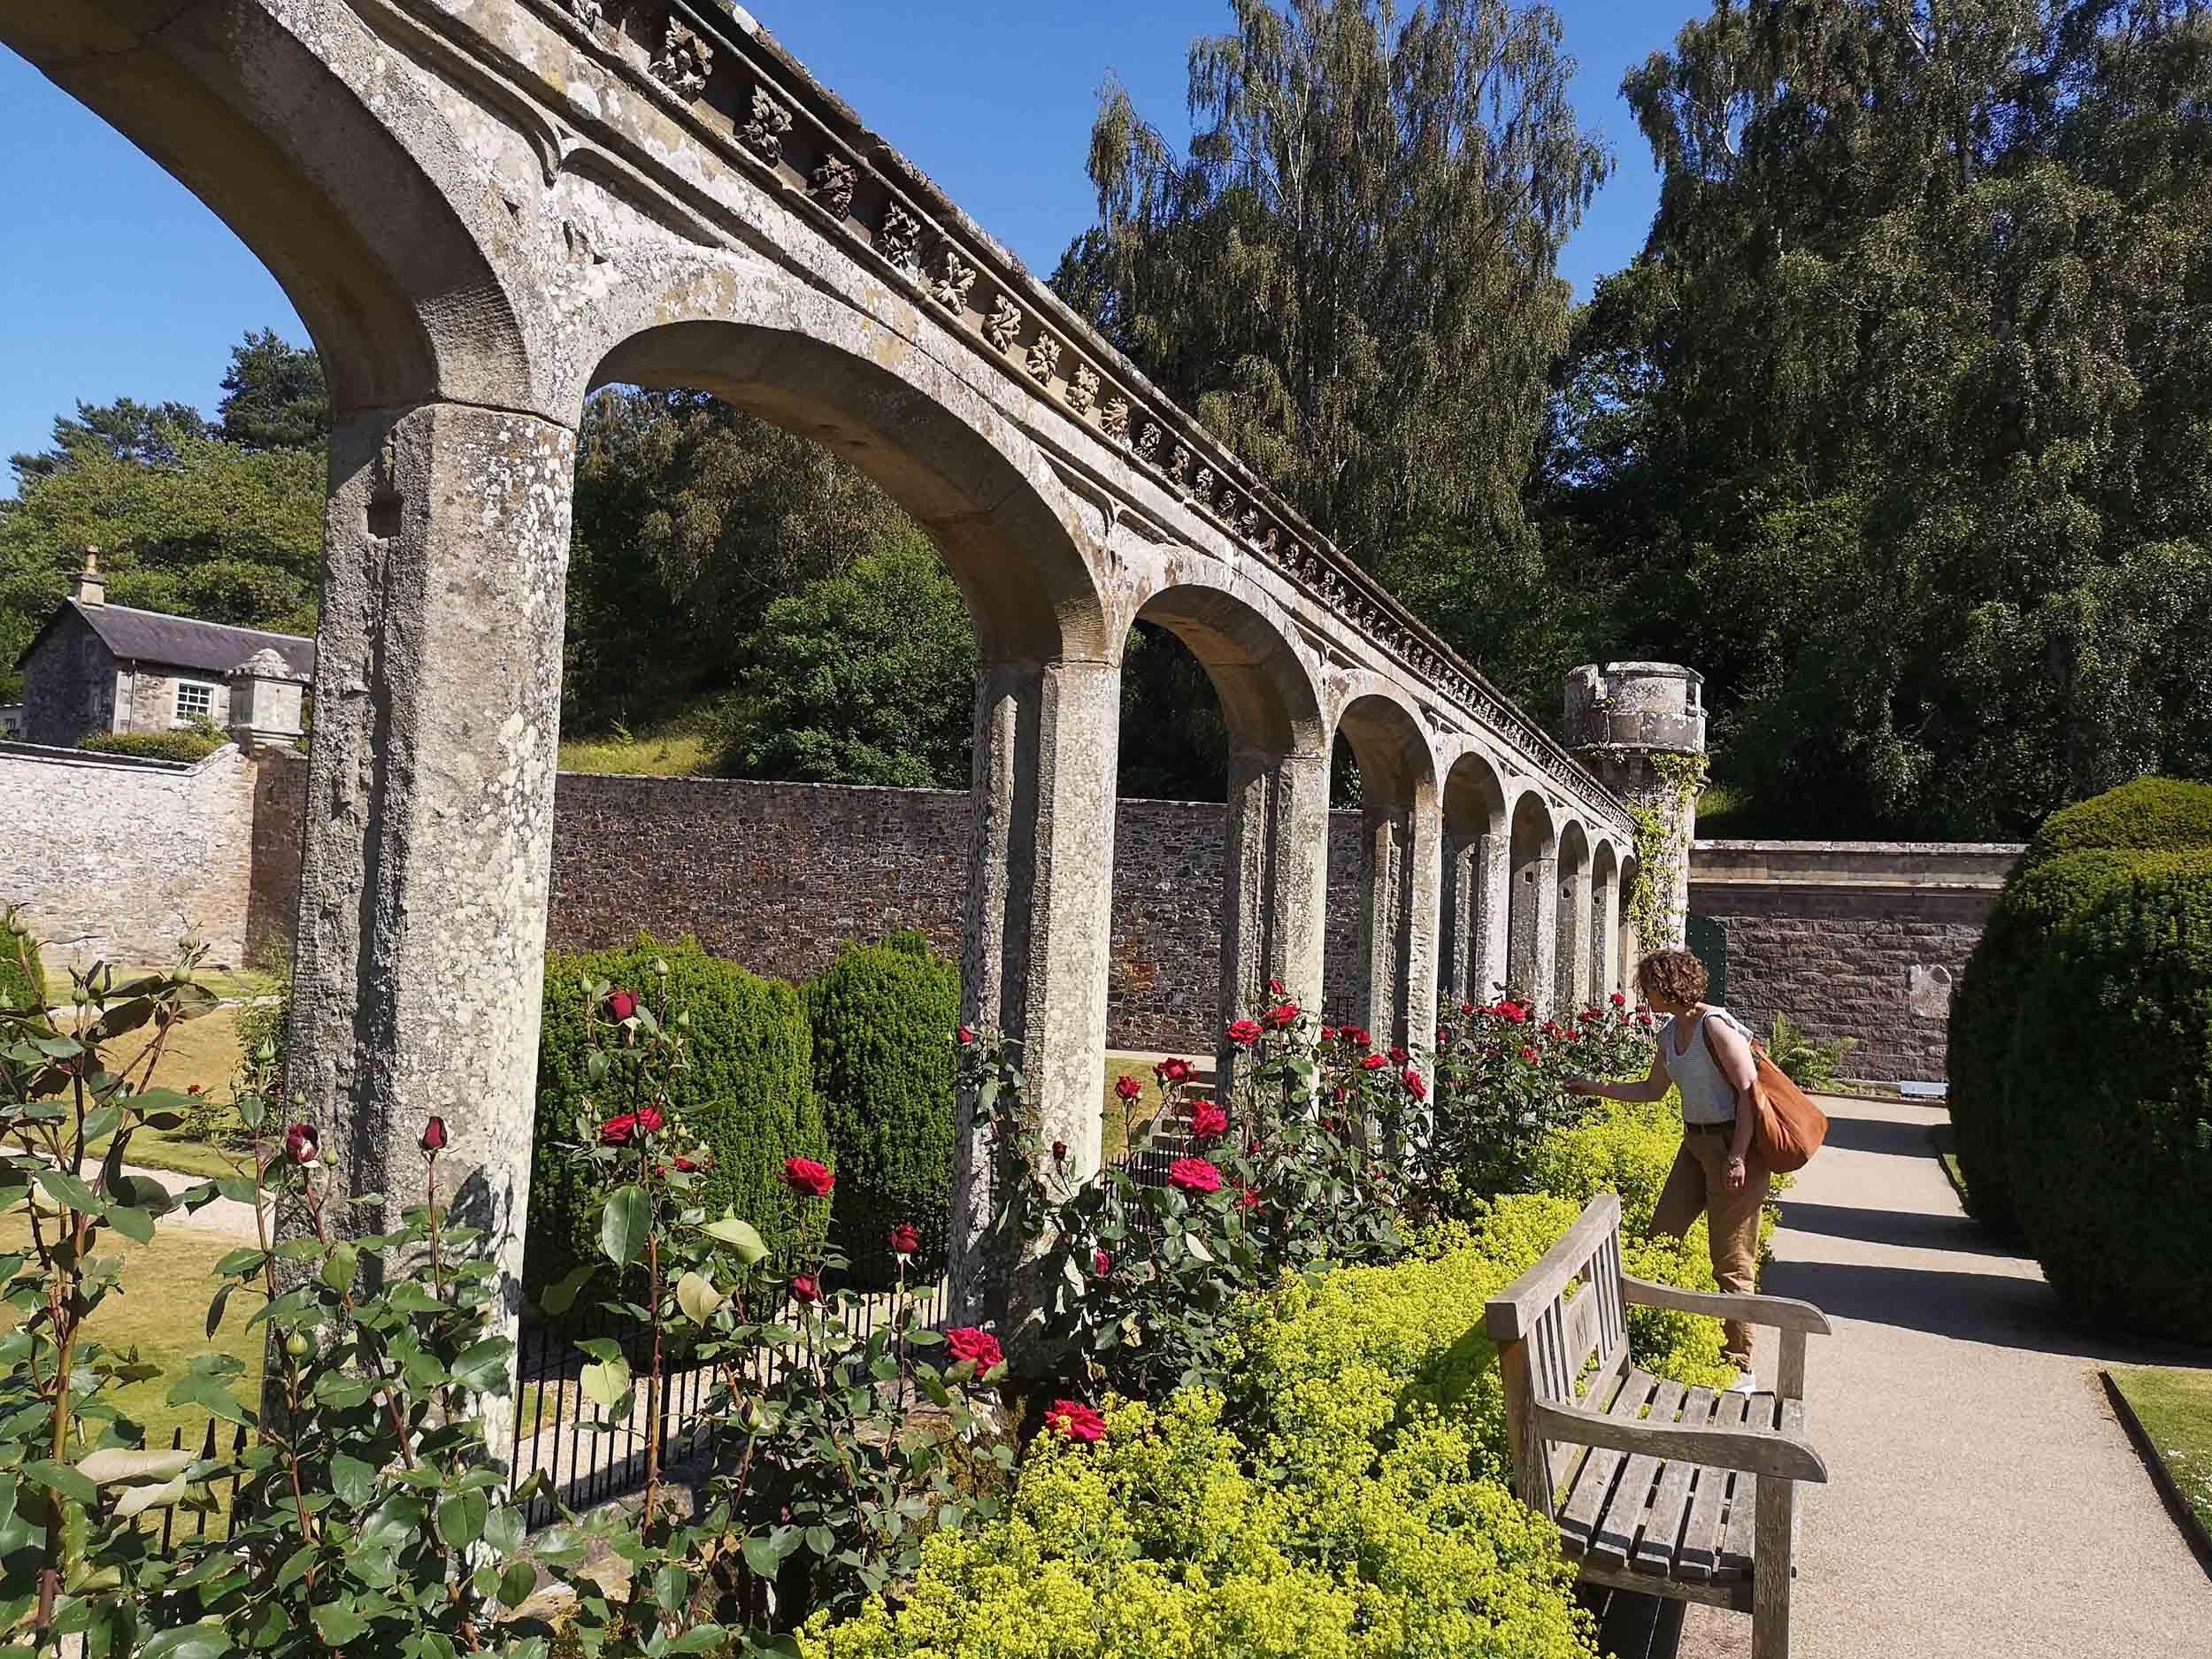 Abbotsford gardens and Sara